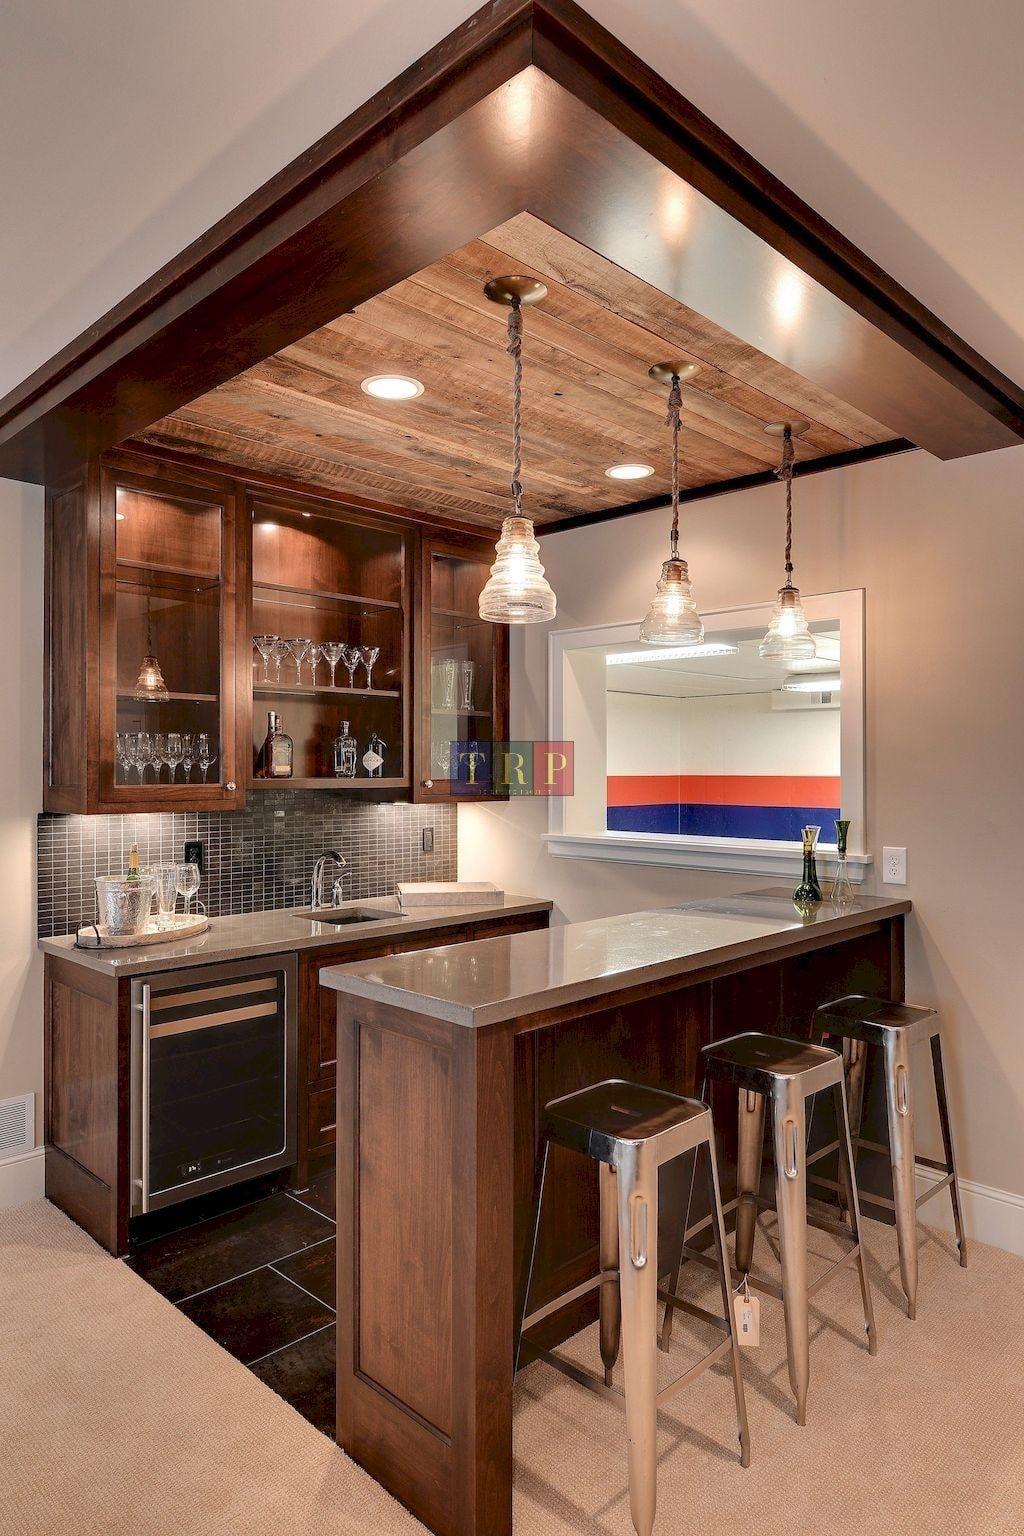 9+ Kitchen Basement Ideas Basement Kitchenette Bar Pictures ...